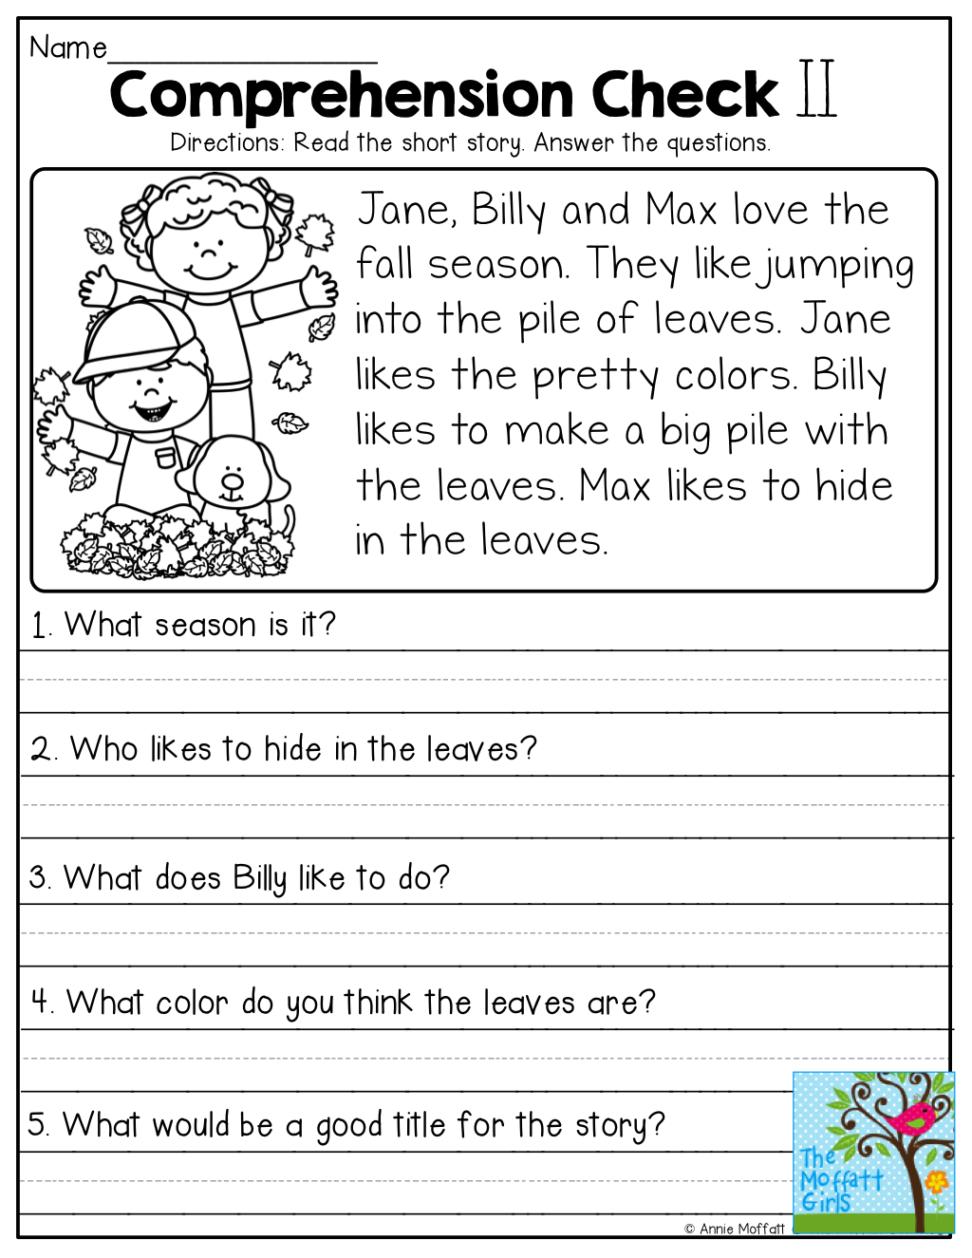 Worksheet. Free Printable Reading Comprehension Worksheets - Free | Free Printable Reading Comprehension Worksheets